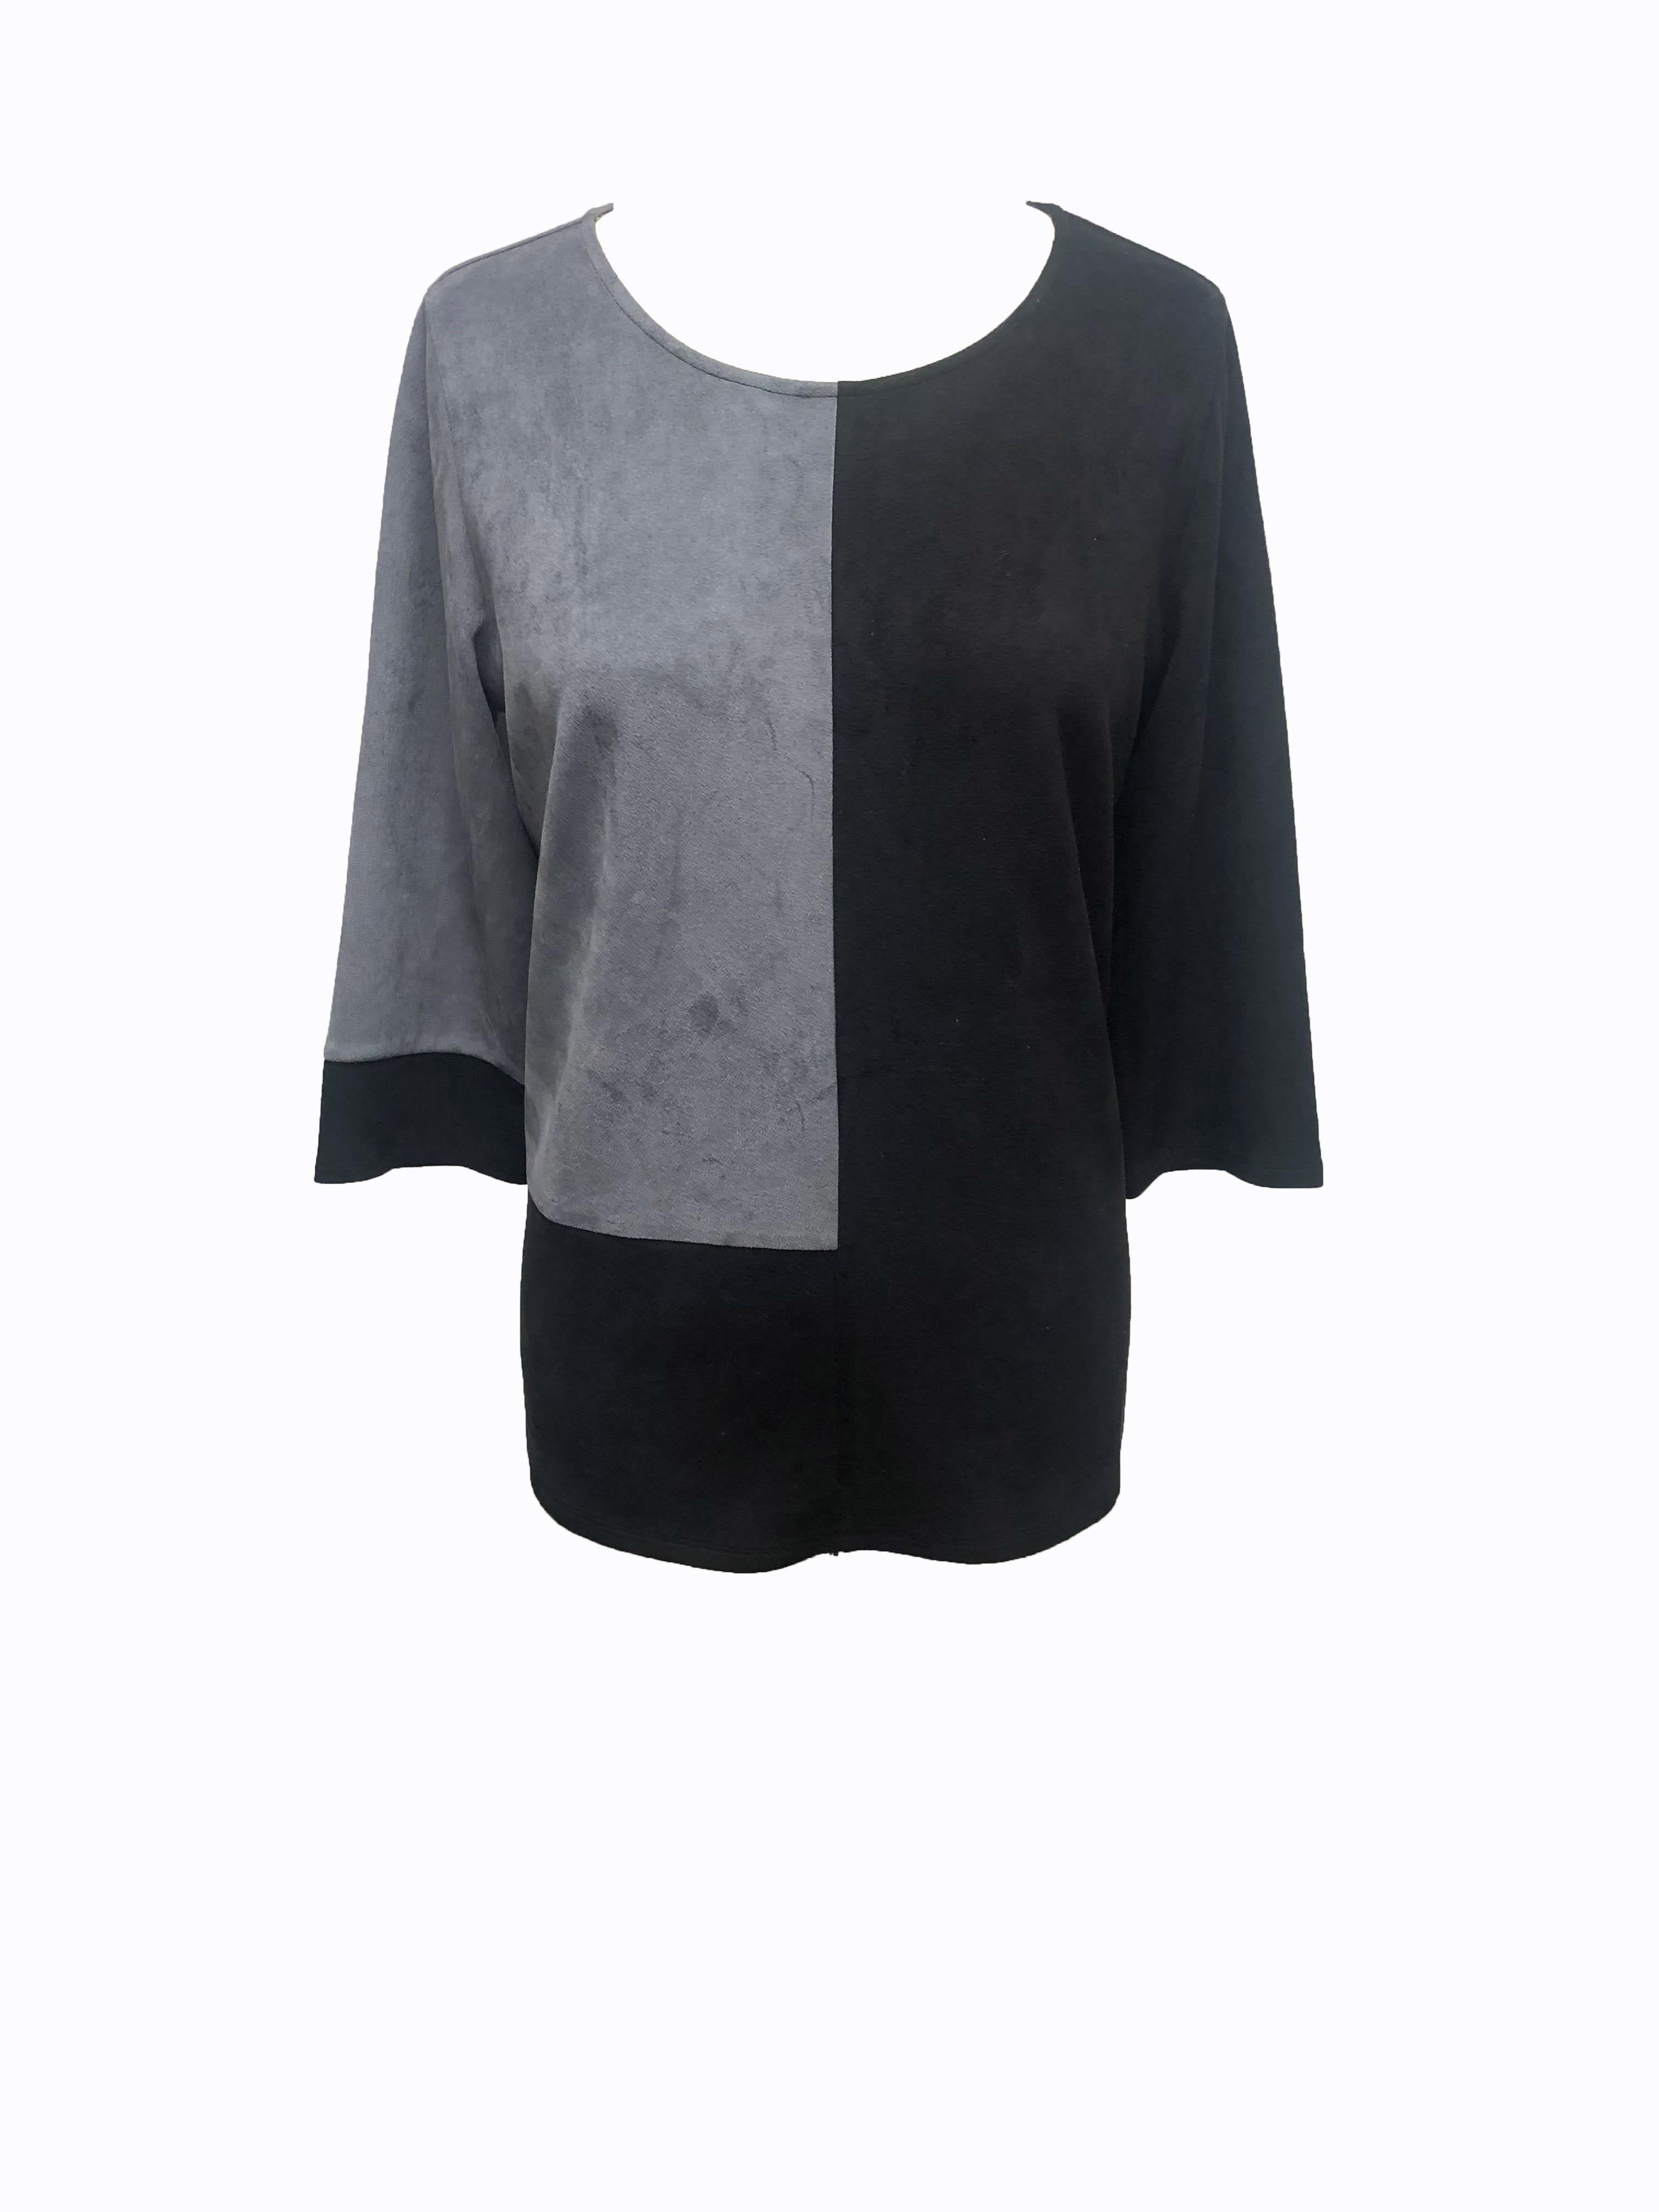 Alexa Top - Gray black - Front